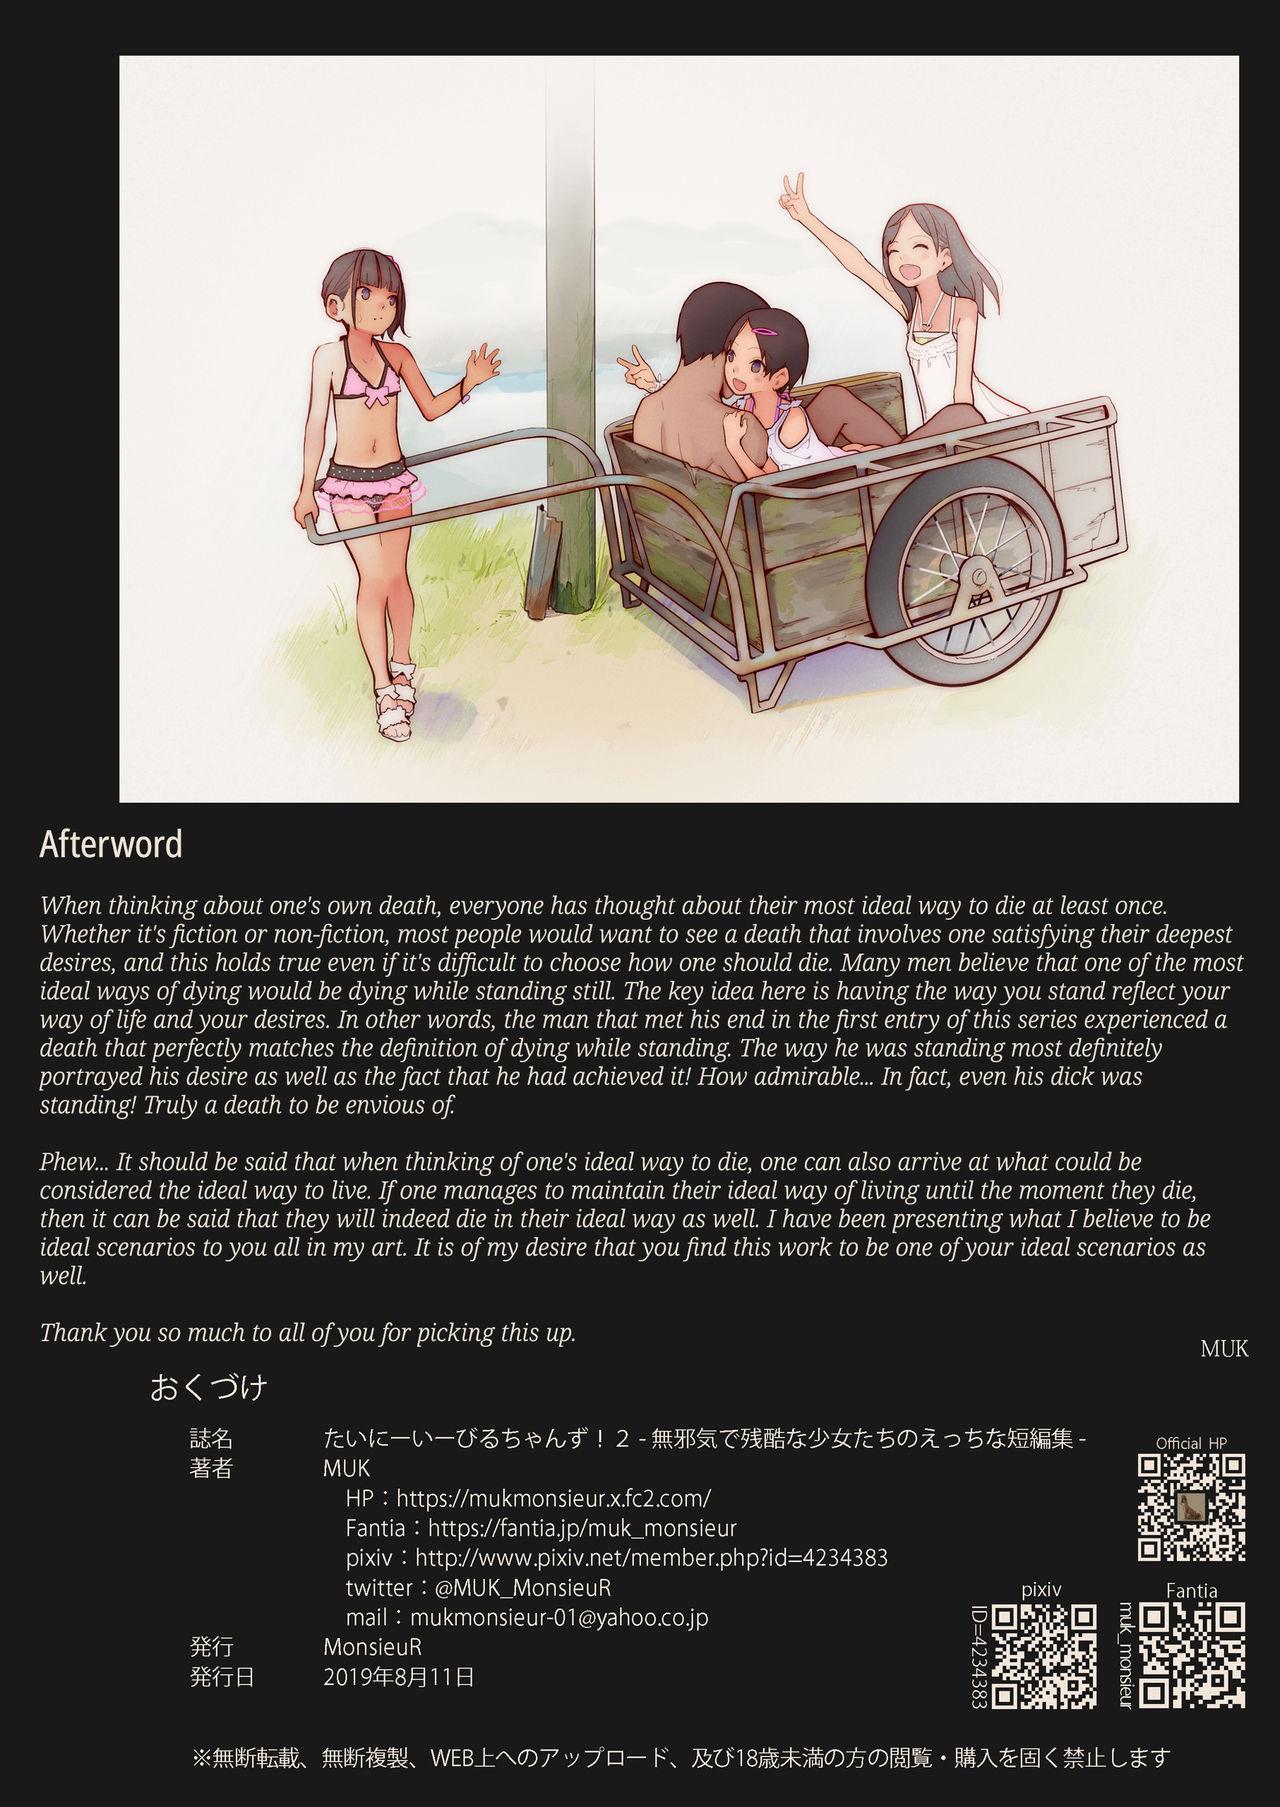 [MonsieuR (MUK)] Tiny Evil chans! 2 -Mujaki de Zankoku na Shoujo-tachi no Ecchi na Tanpenshuu- [English] {Hennojin} [Decensored] [Digital] 17